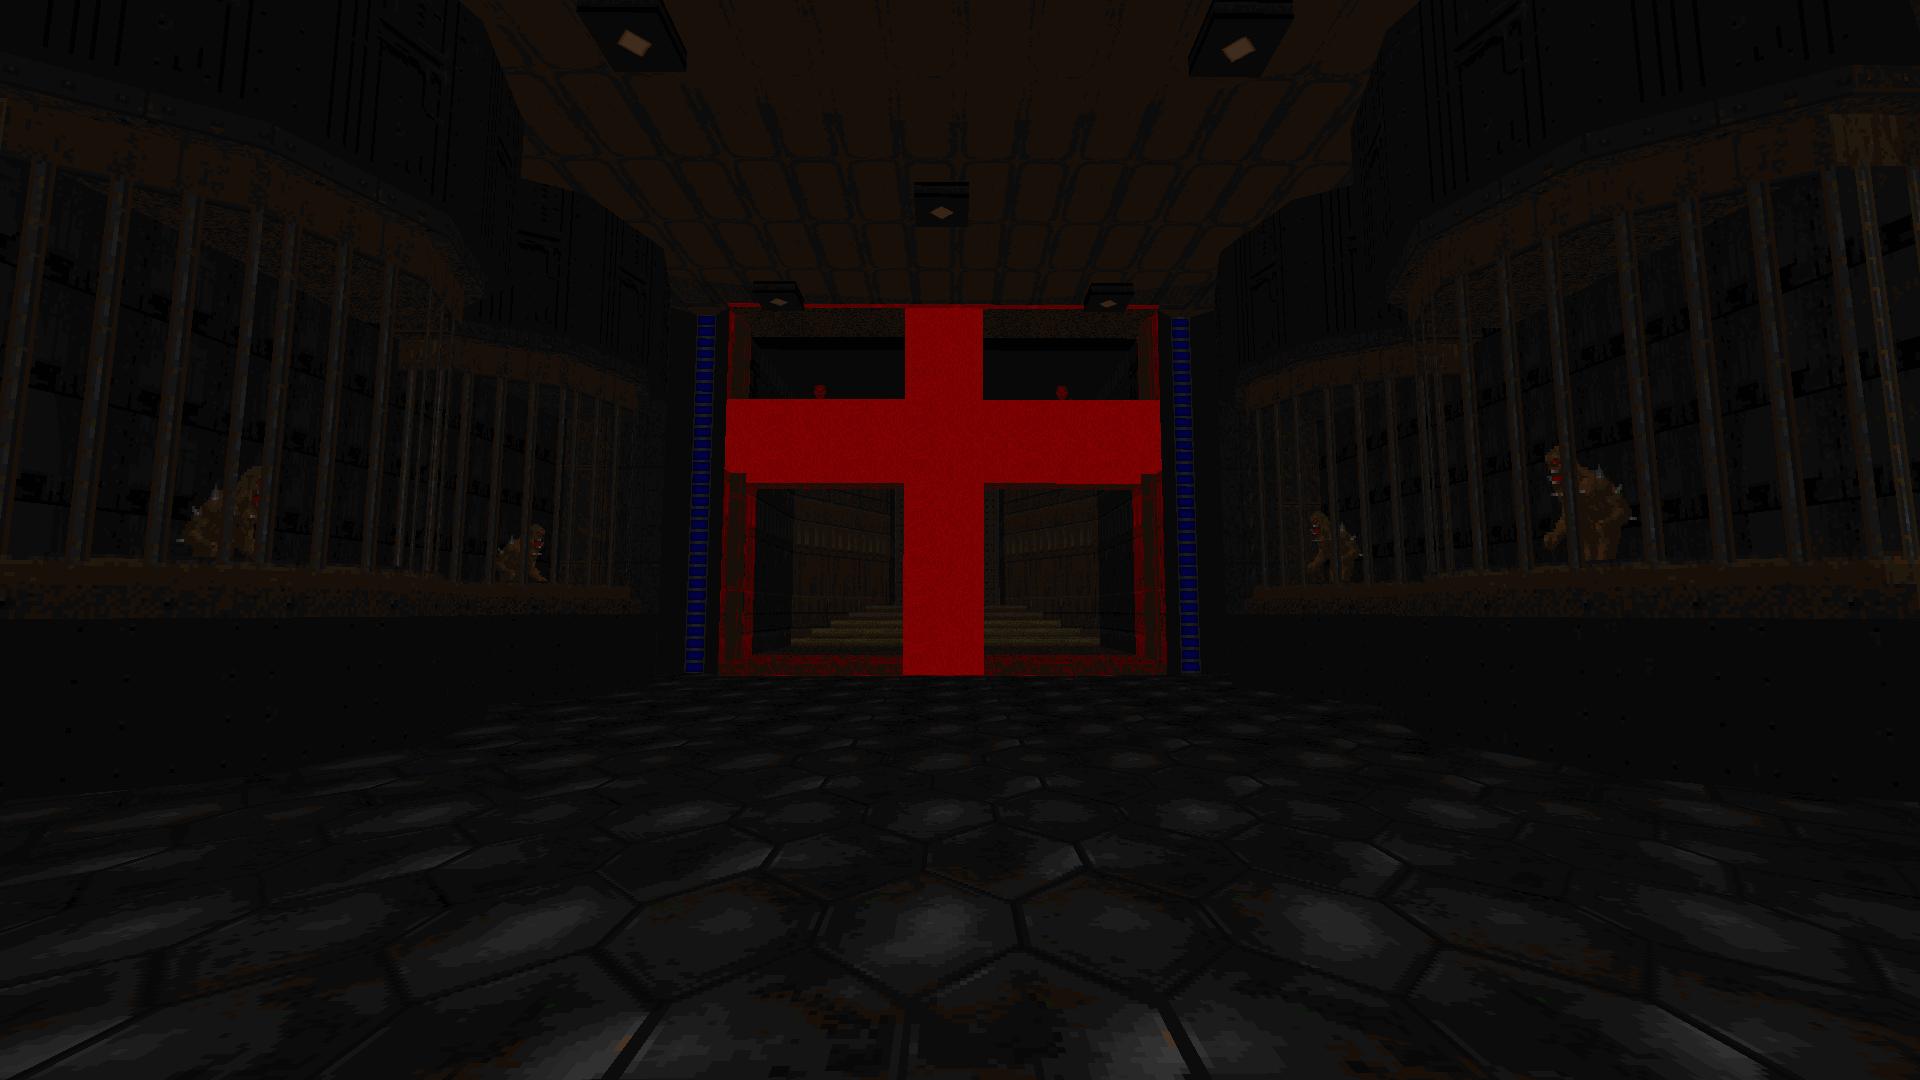 Screenshot_Doom_20200504_205933.png.ab4b8f6754074b7b4f5fcc7f365348d3.png